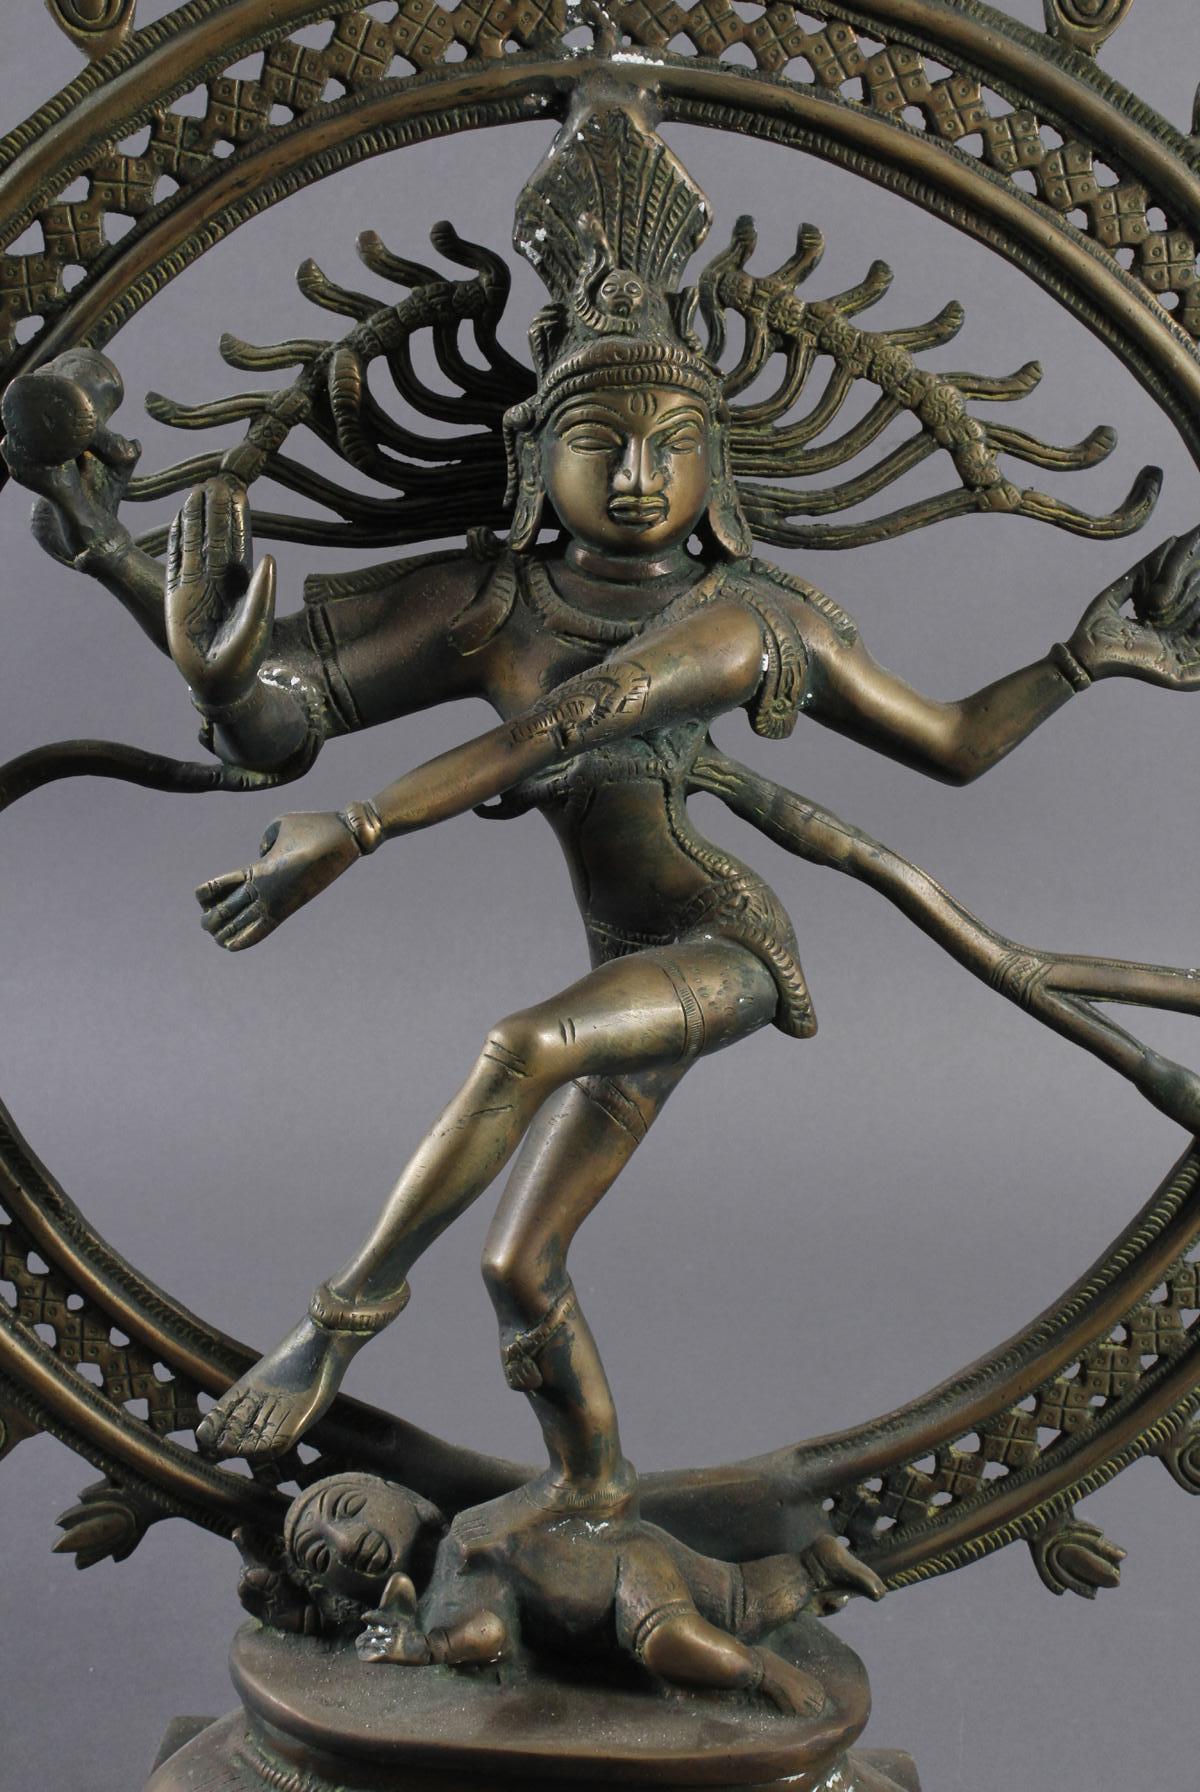 Nataraja Shiva im Flammenrad, Indien, 19. / 20. Jahrhundert-2